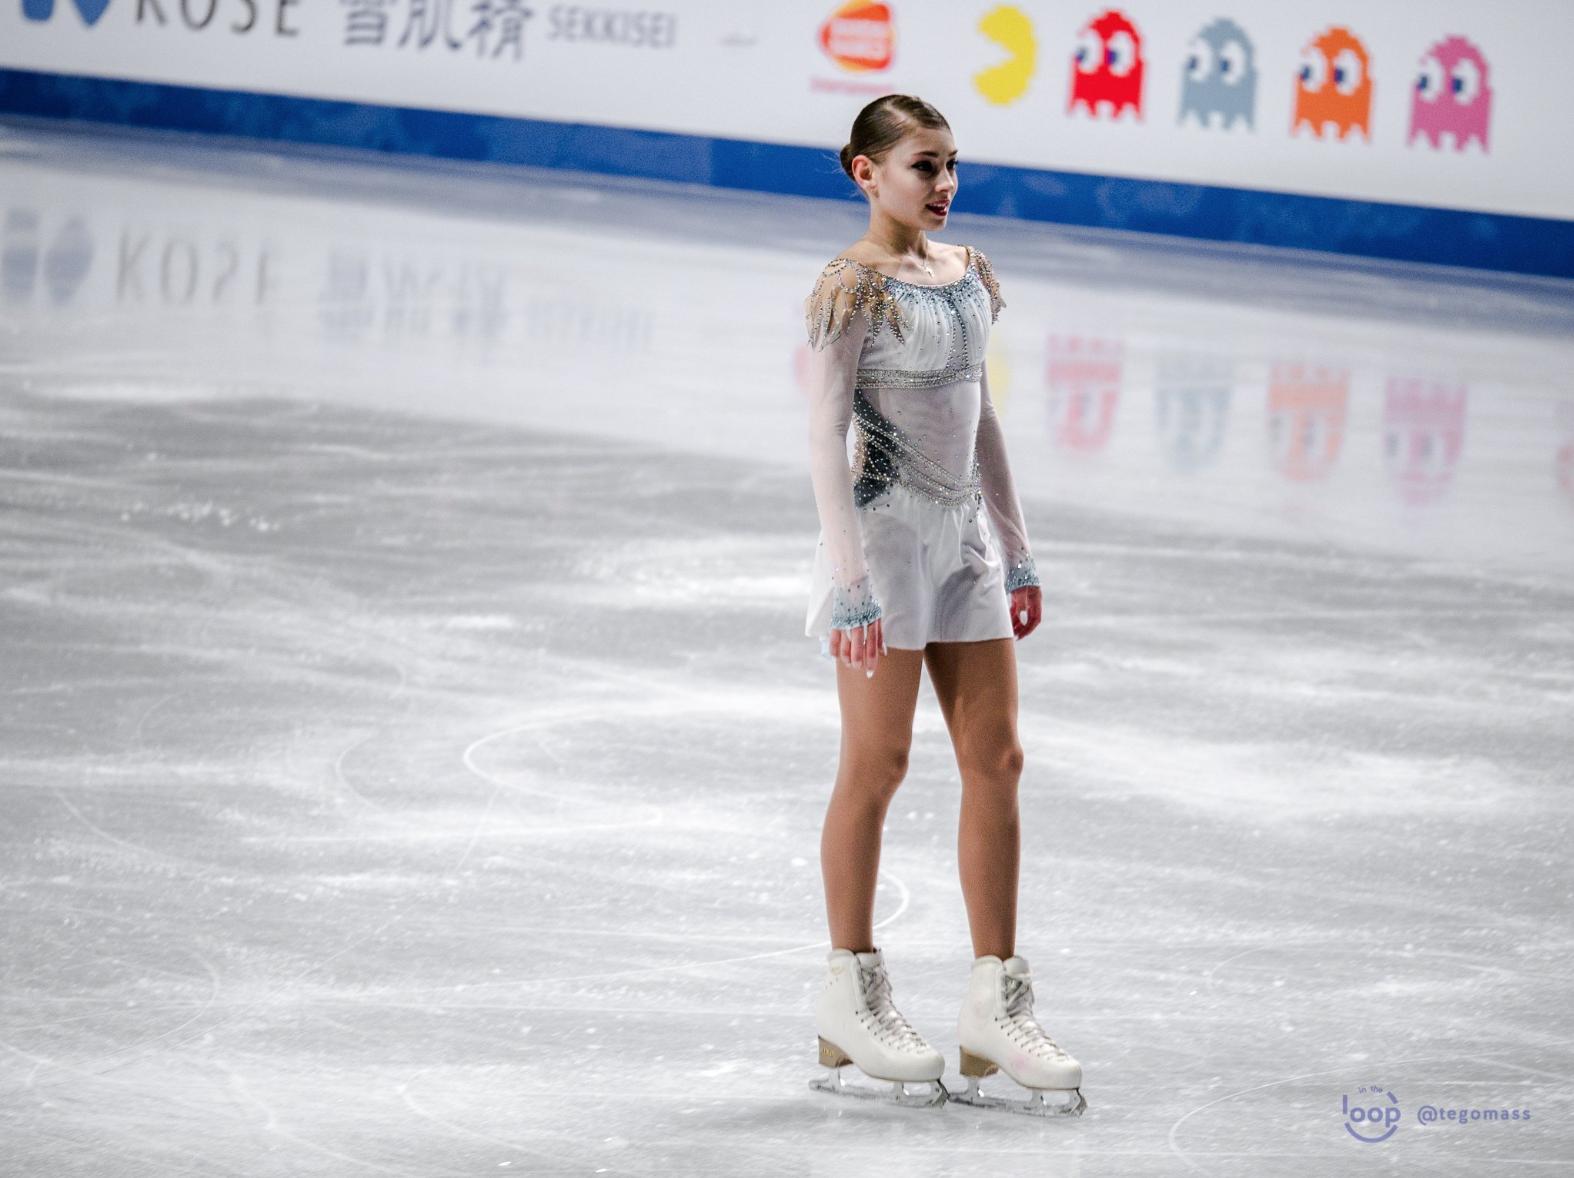 Alena Kostornaia (RUS) at the Short Program of the 2018 Grand Prix Final (   Source: Gabb)